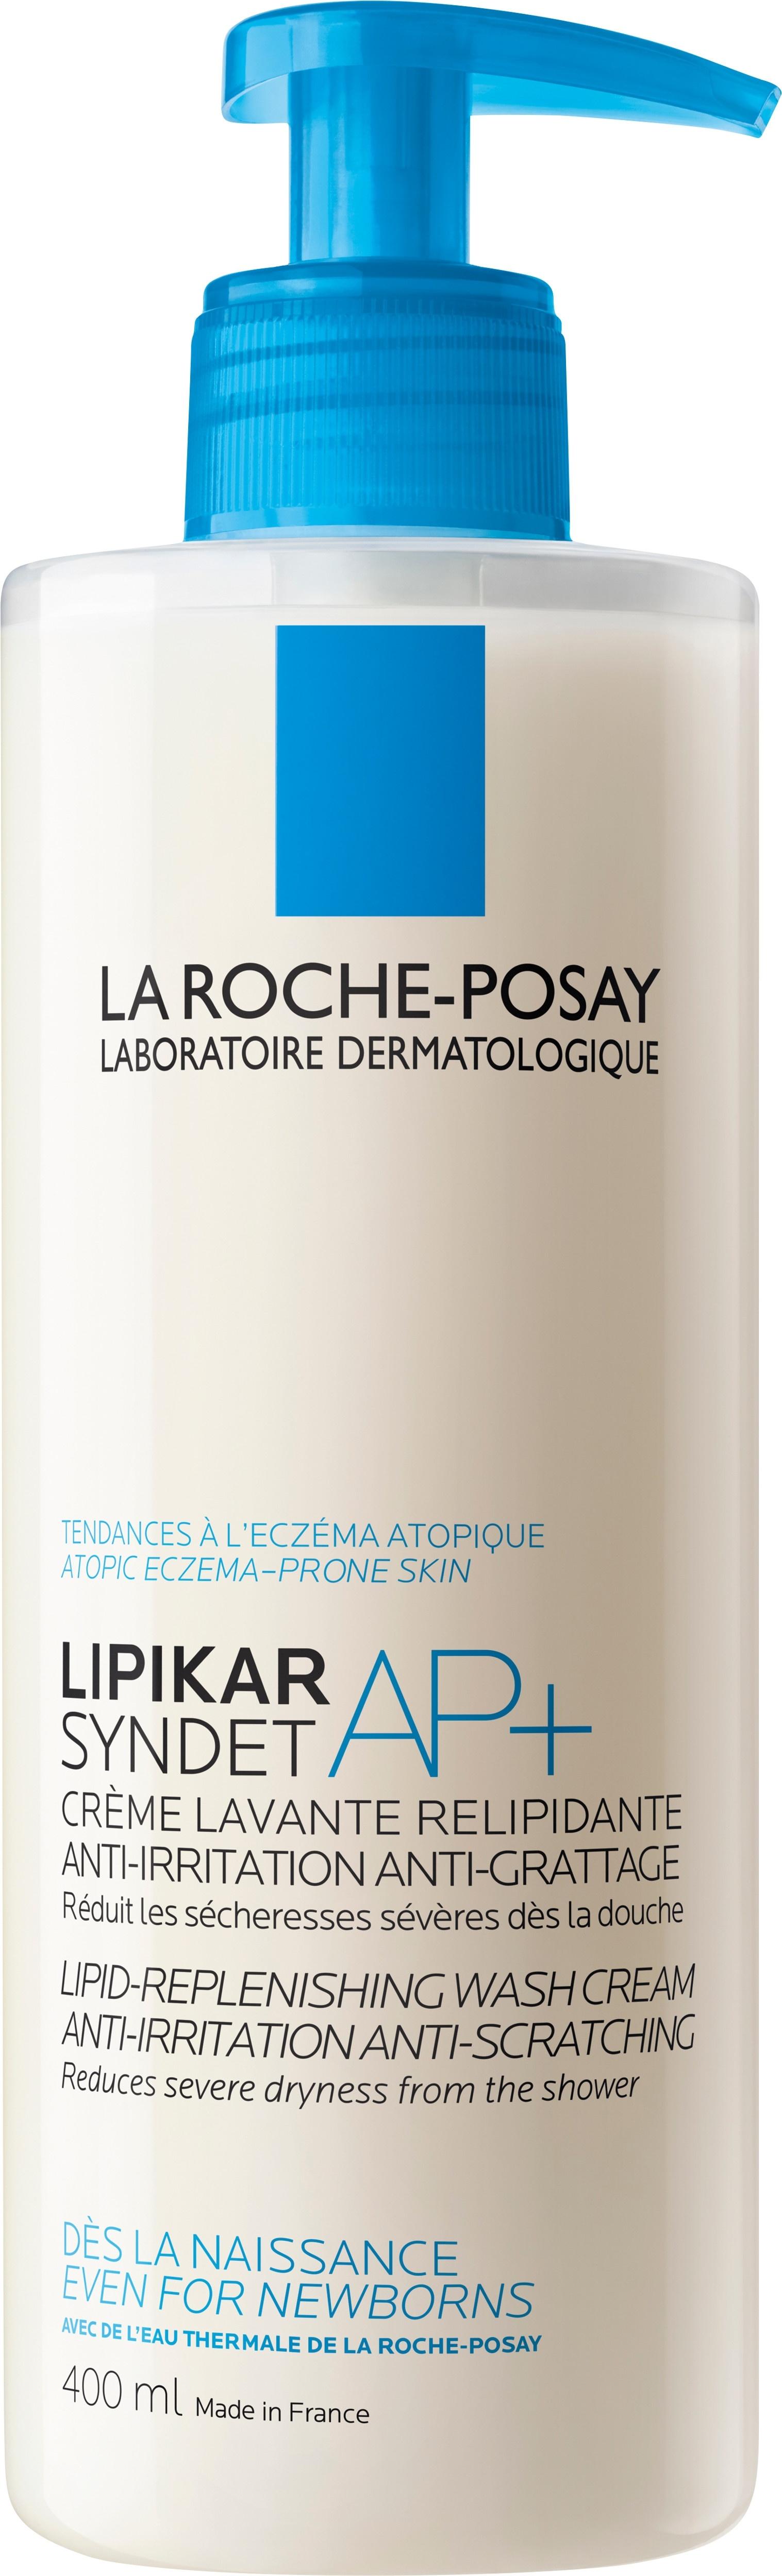 La Roche-Posay Lipikar Syndet AP+ - Lipid Replenishing Cream Wash 400ml